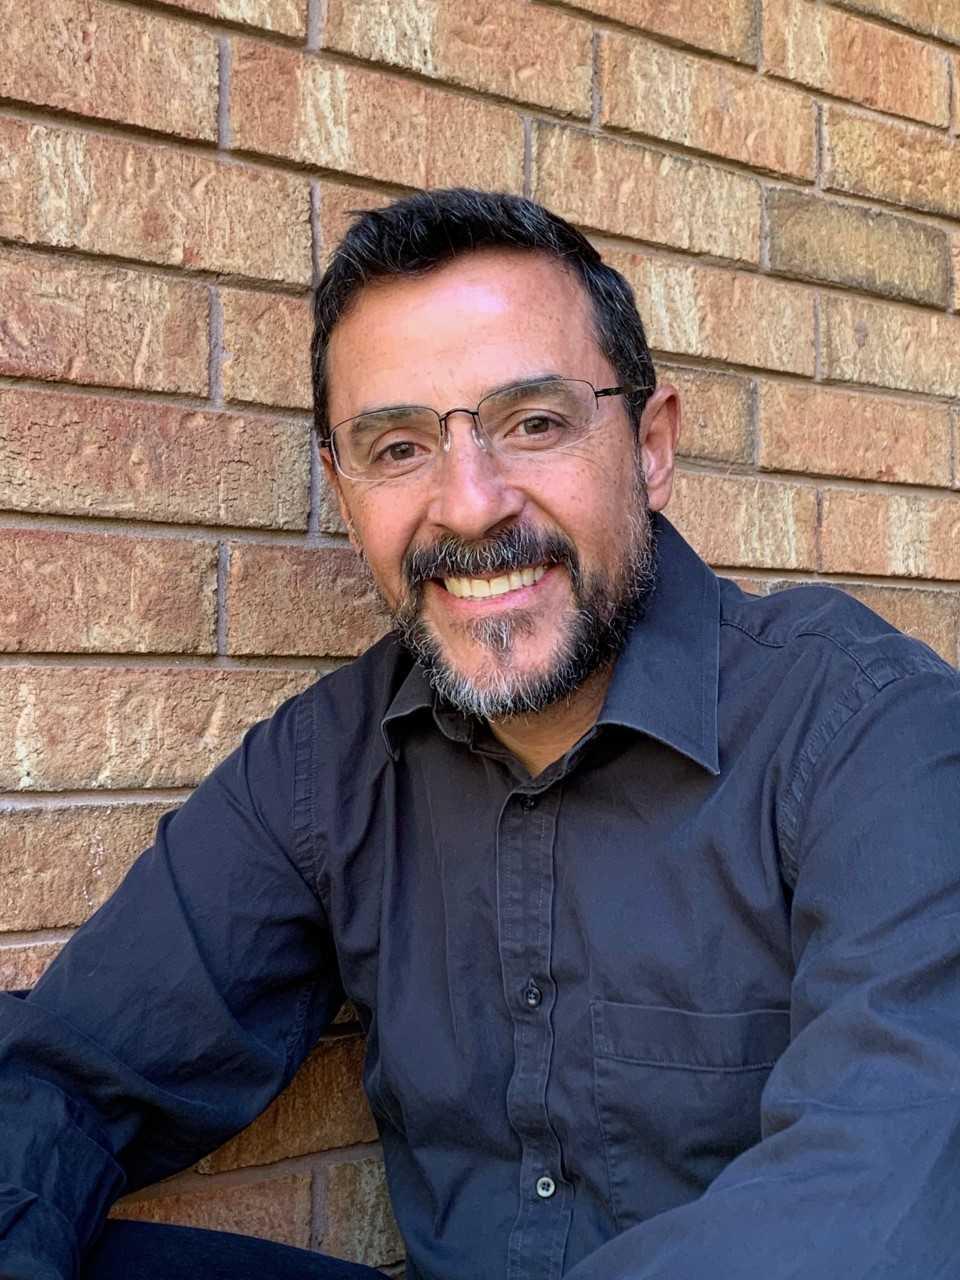 Headshot of Juan Quiros